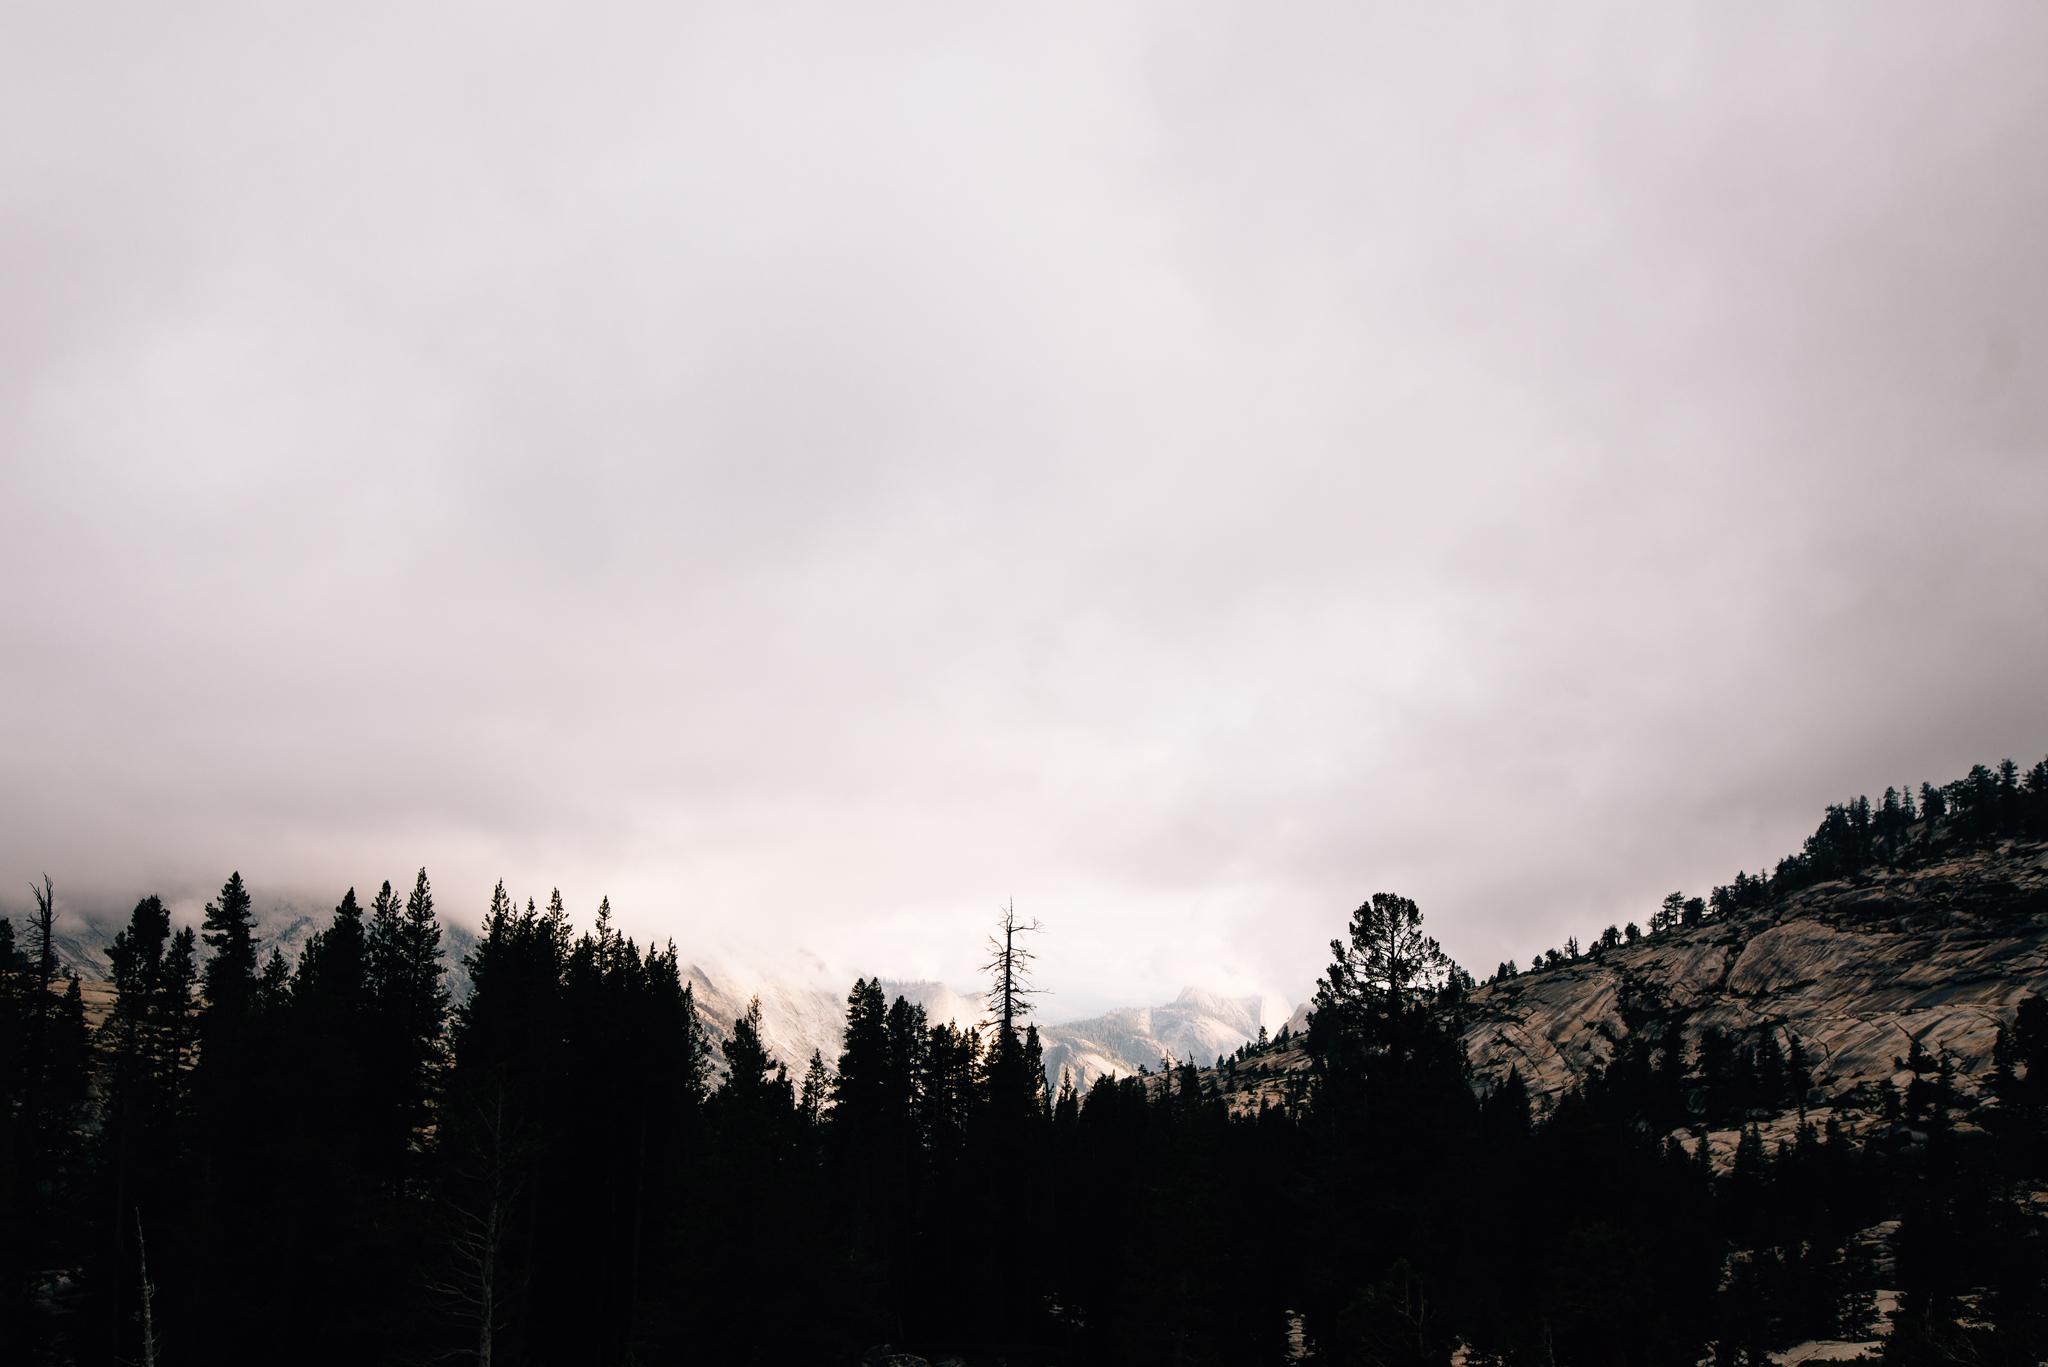 ©The Ryans Photography - Los Angeles Travel - Tuolomne Meadows Yosemite-024.jpg